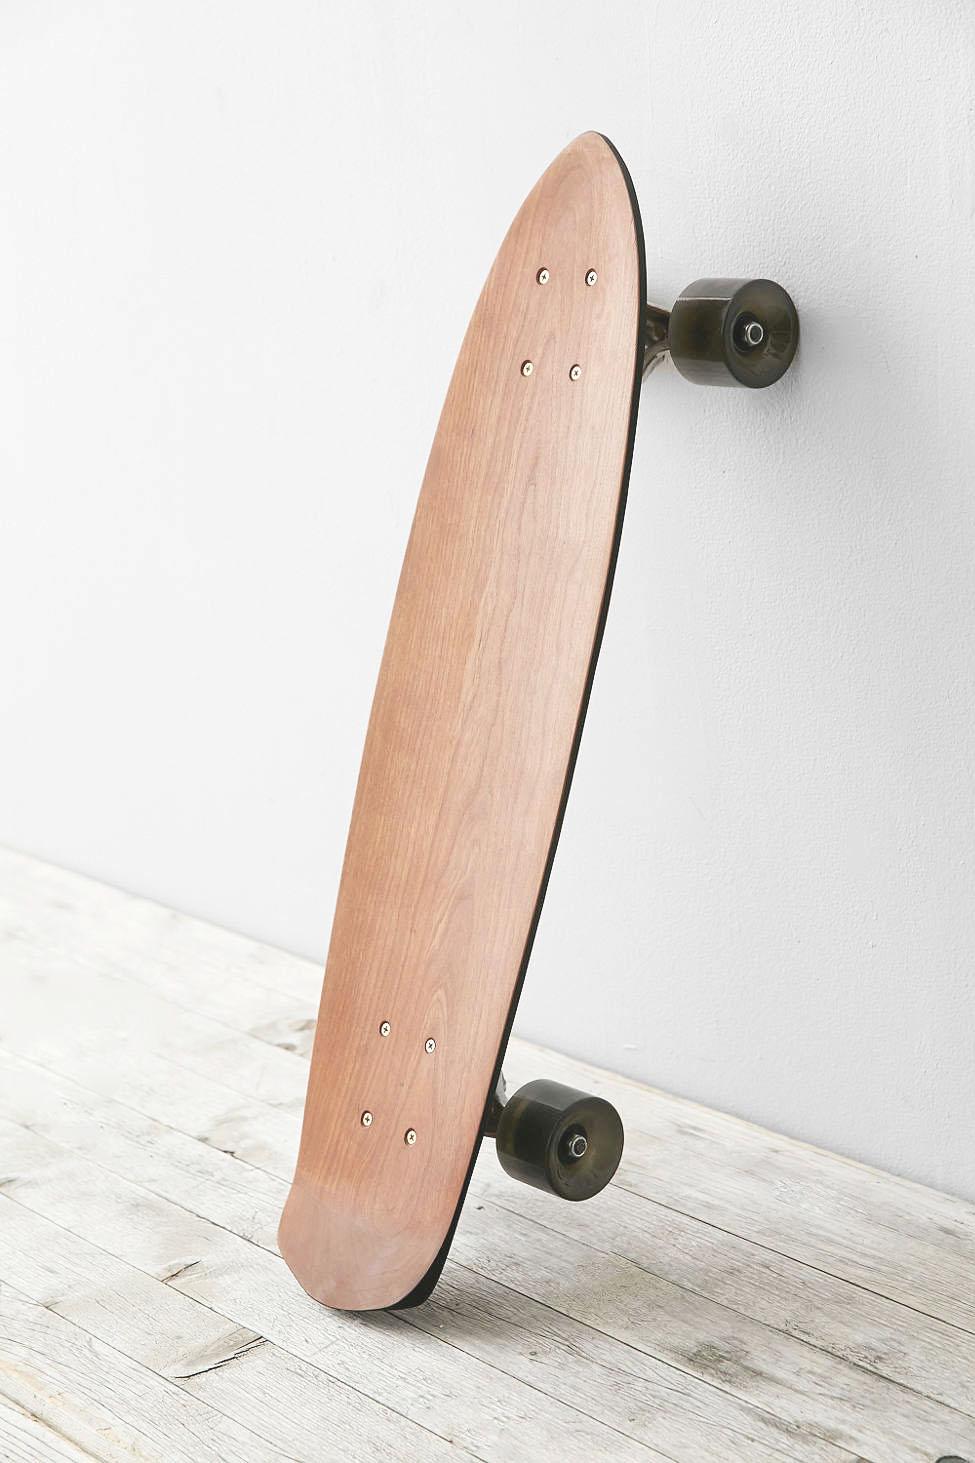 Farmhaus Berks County Skateboard